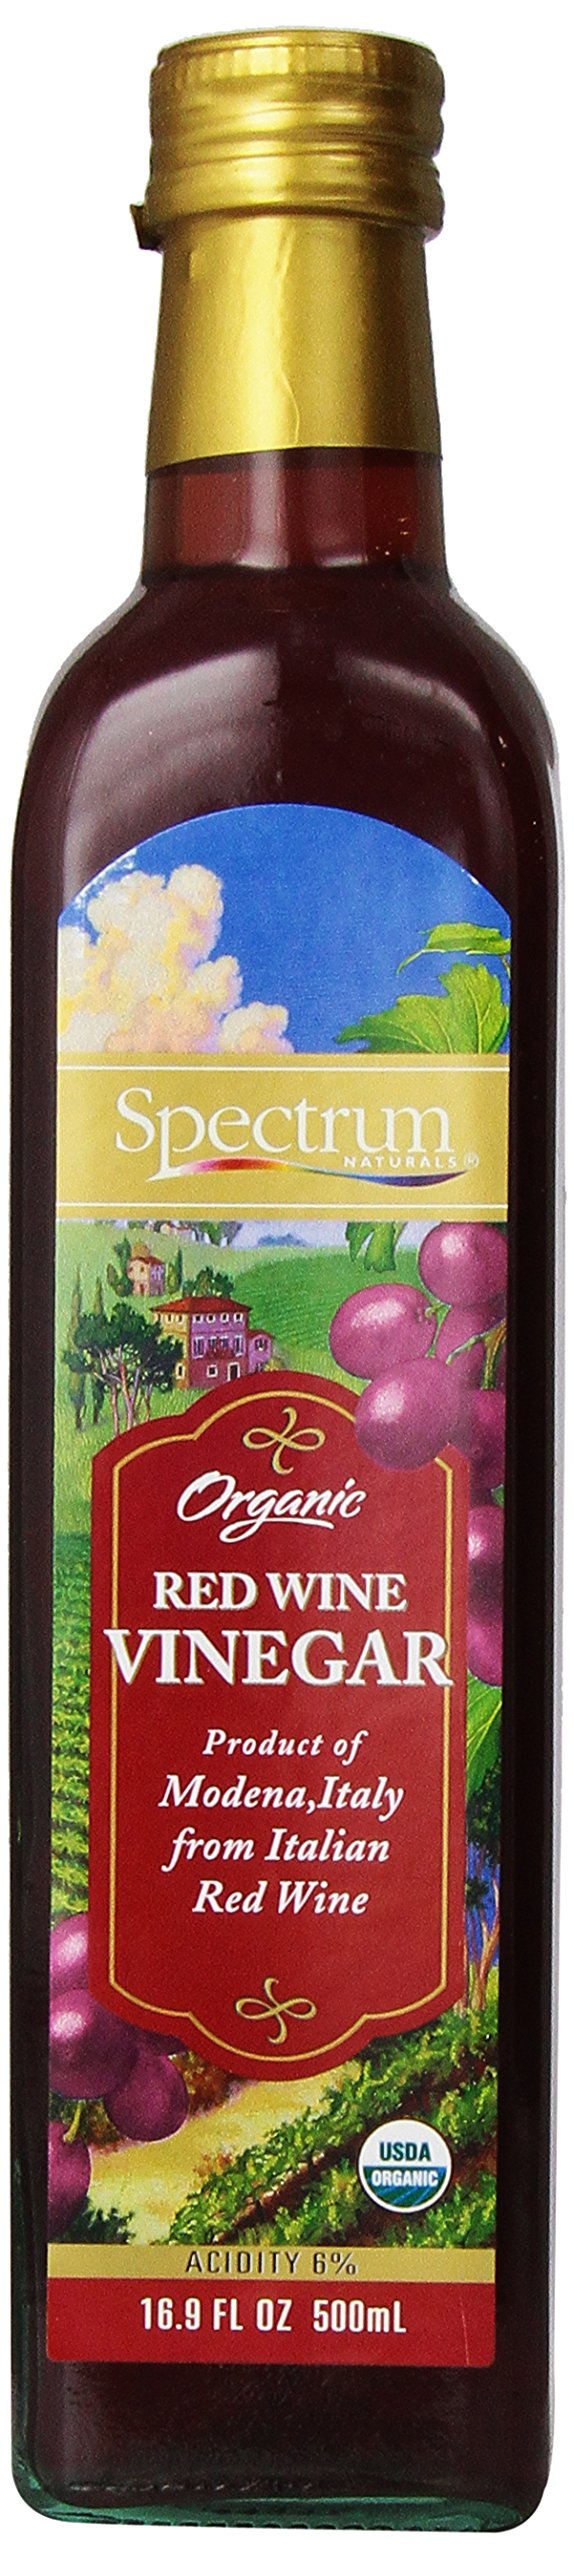 Spectrum Culinary Organic Red Wine Vinegar, 16.9 fl. oz. by Spectrum